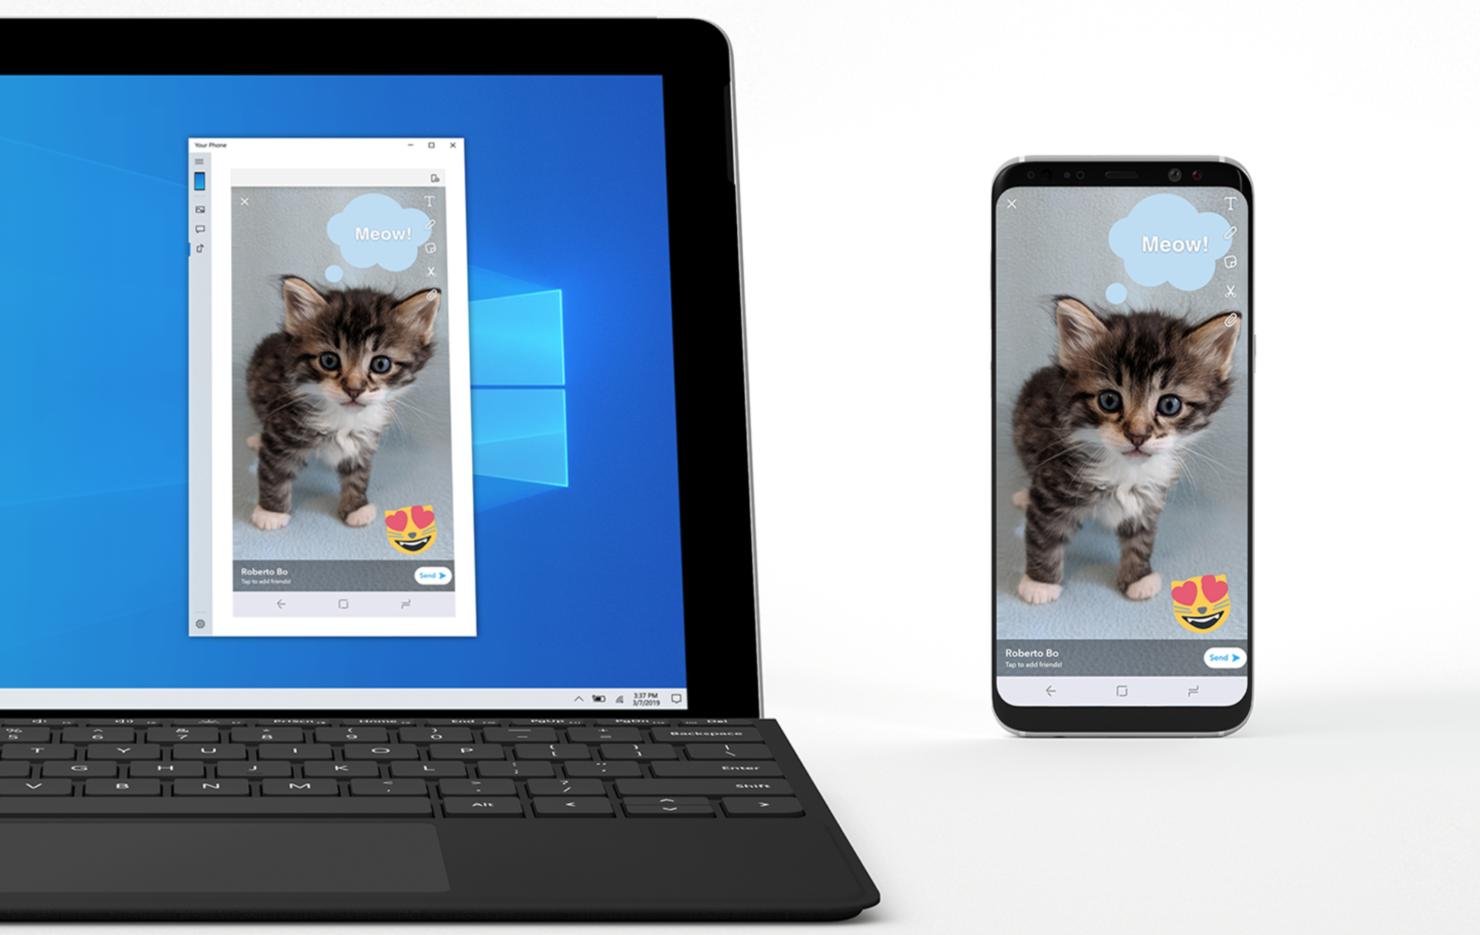 windows 10 android screen mirroring phone screen